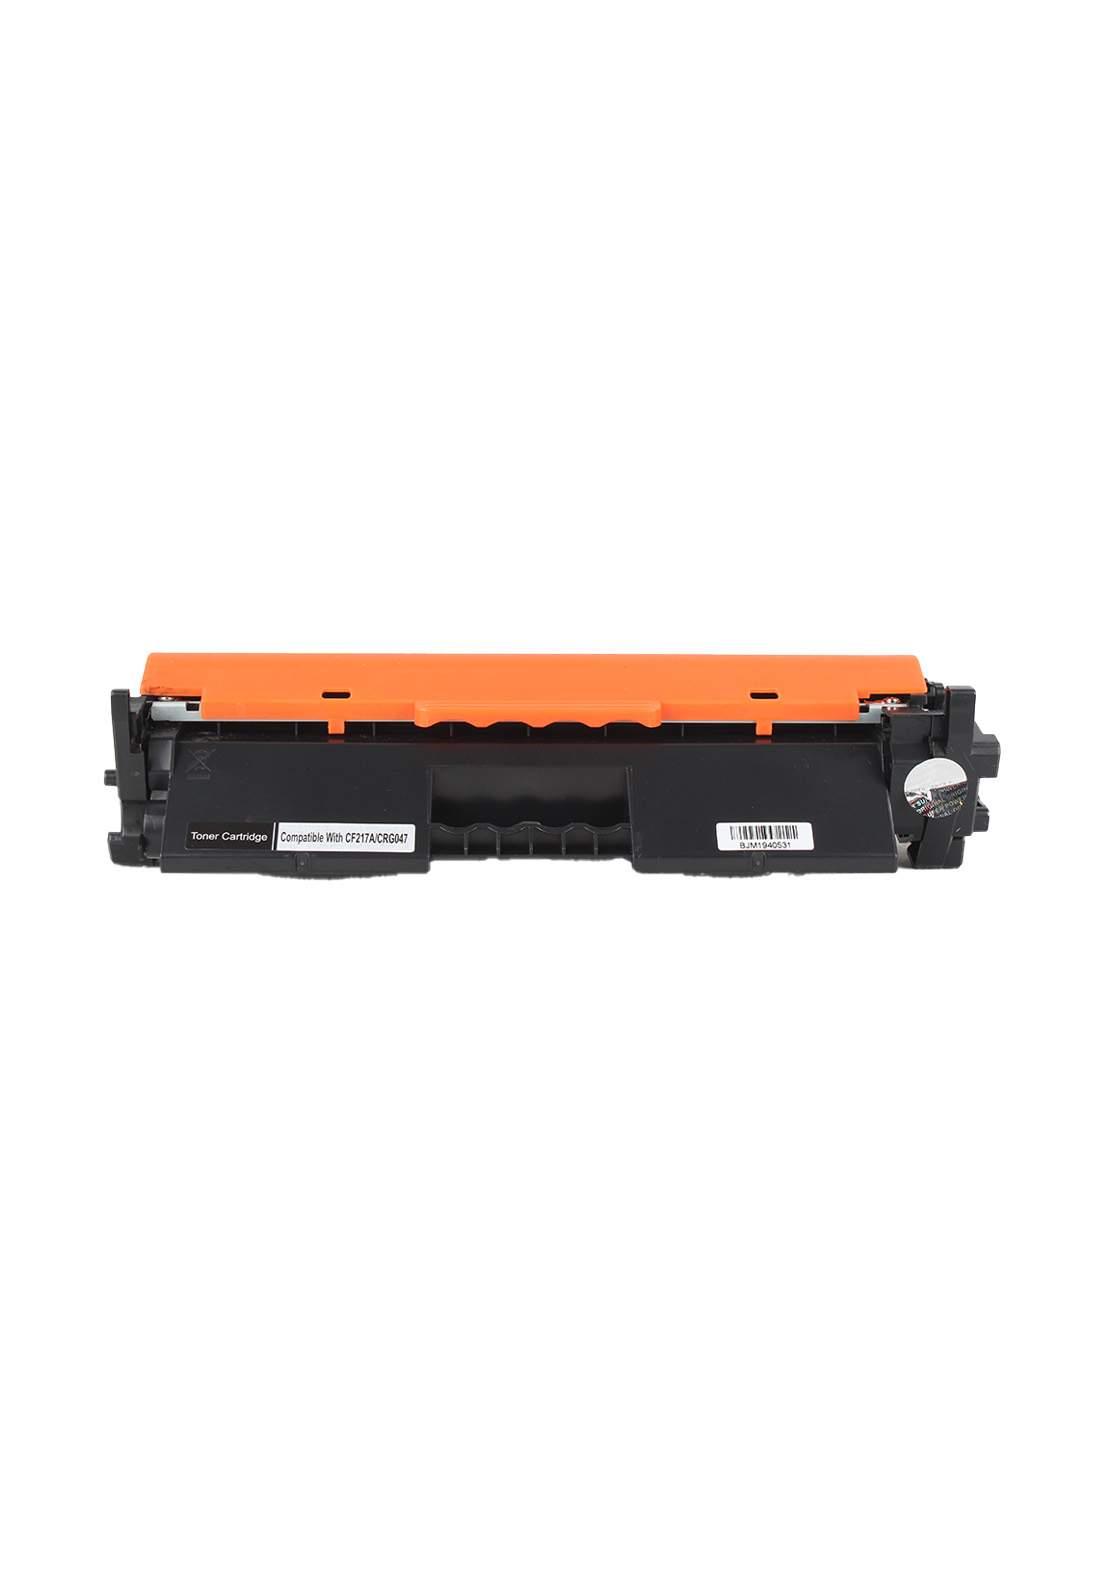 Super Power Plus CF217A/CRGO47 Laser Printer Toner Cartridge خرطوشة حبر